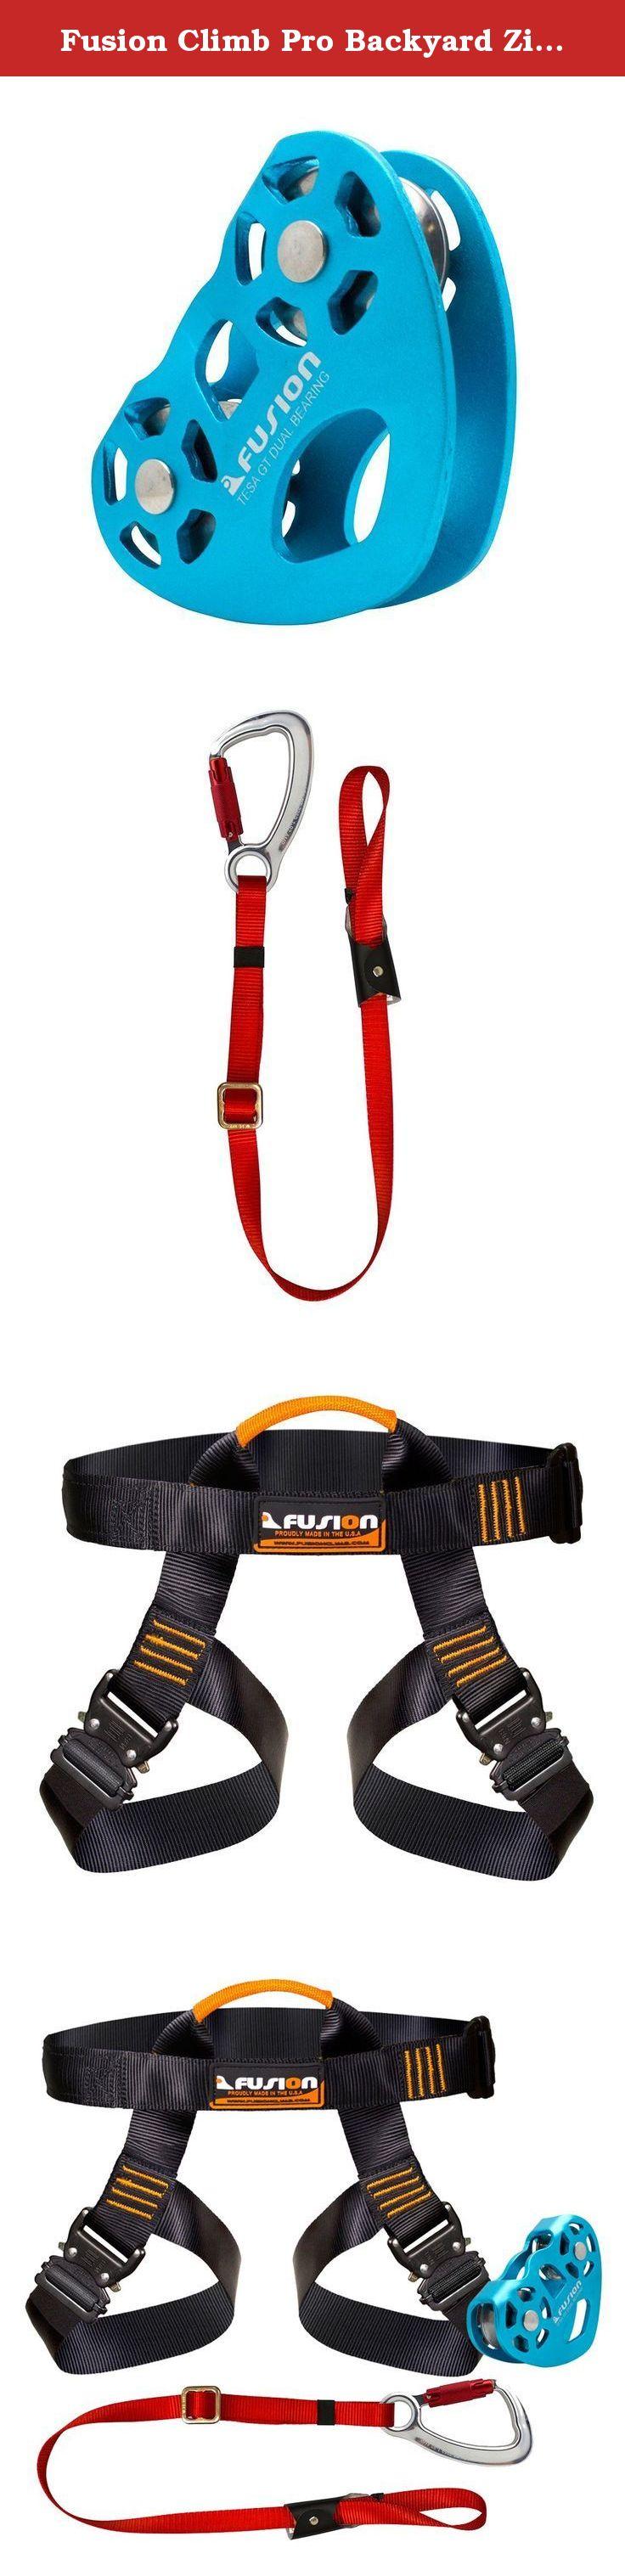 fusion climb pro backyard zip line kit fk a hlt 02 harness lanyard